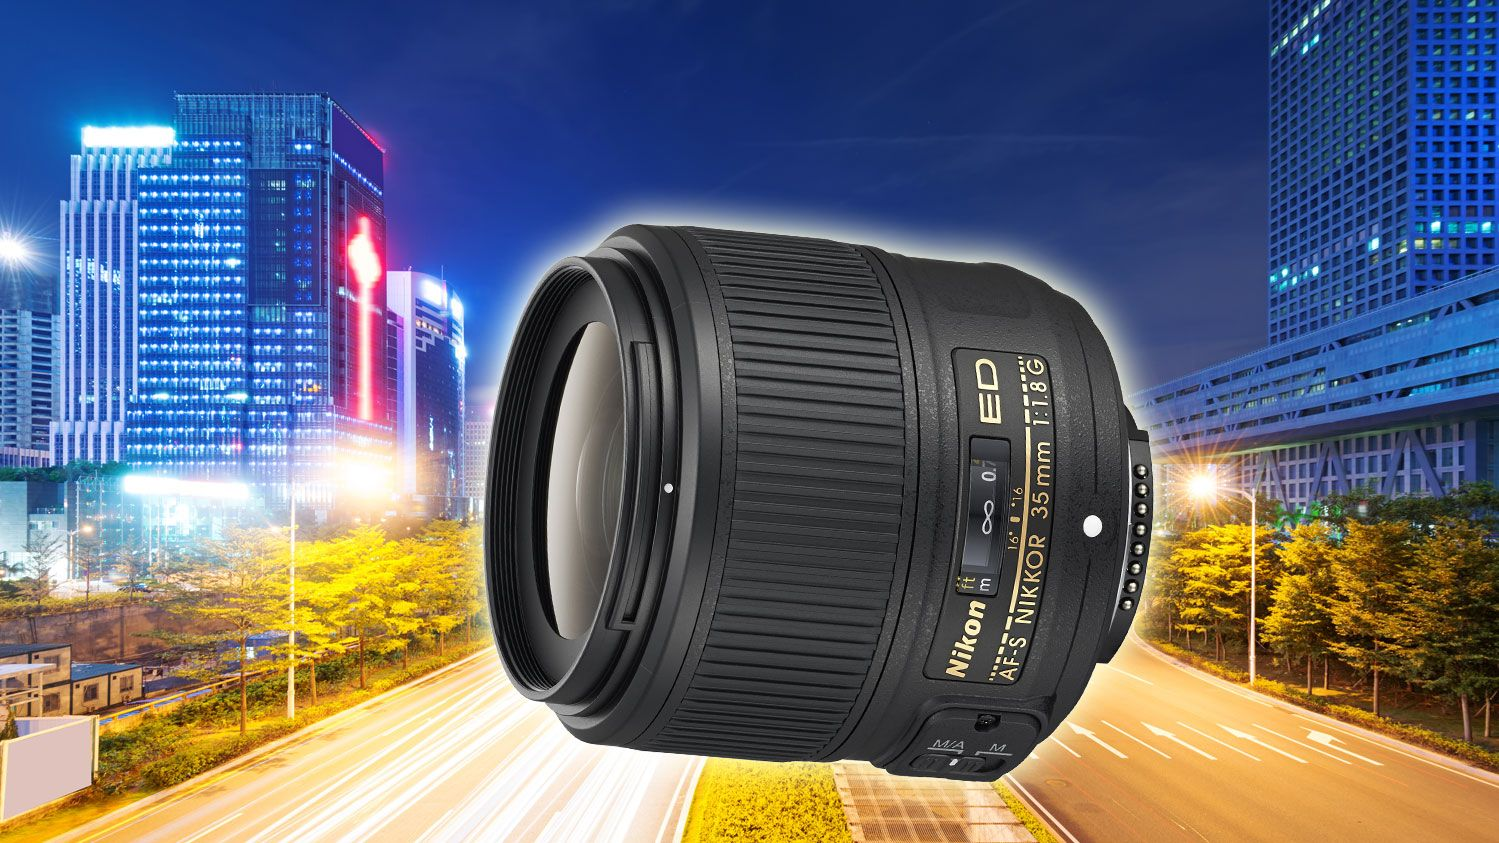 Objektiv for gatefoto fra Nikon